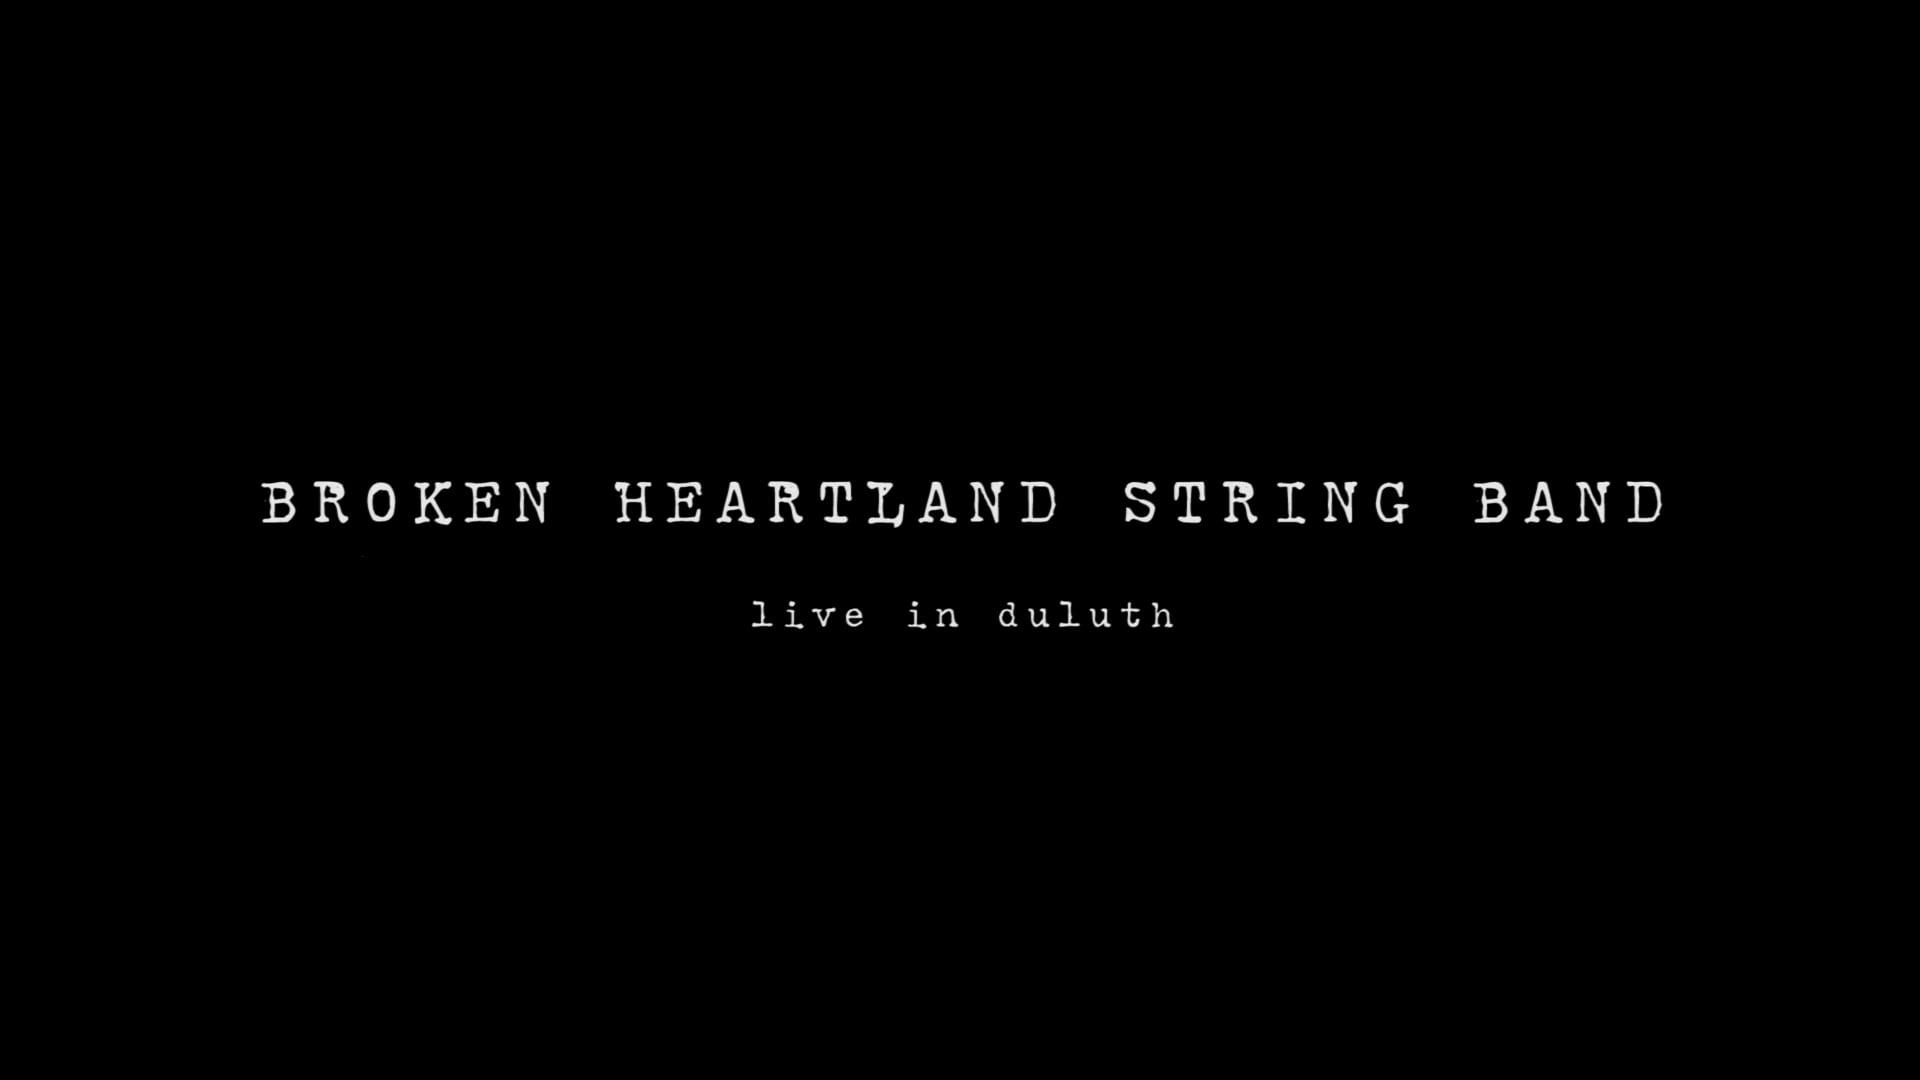 Broken Heartland String Band - Live in Duluth